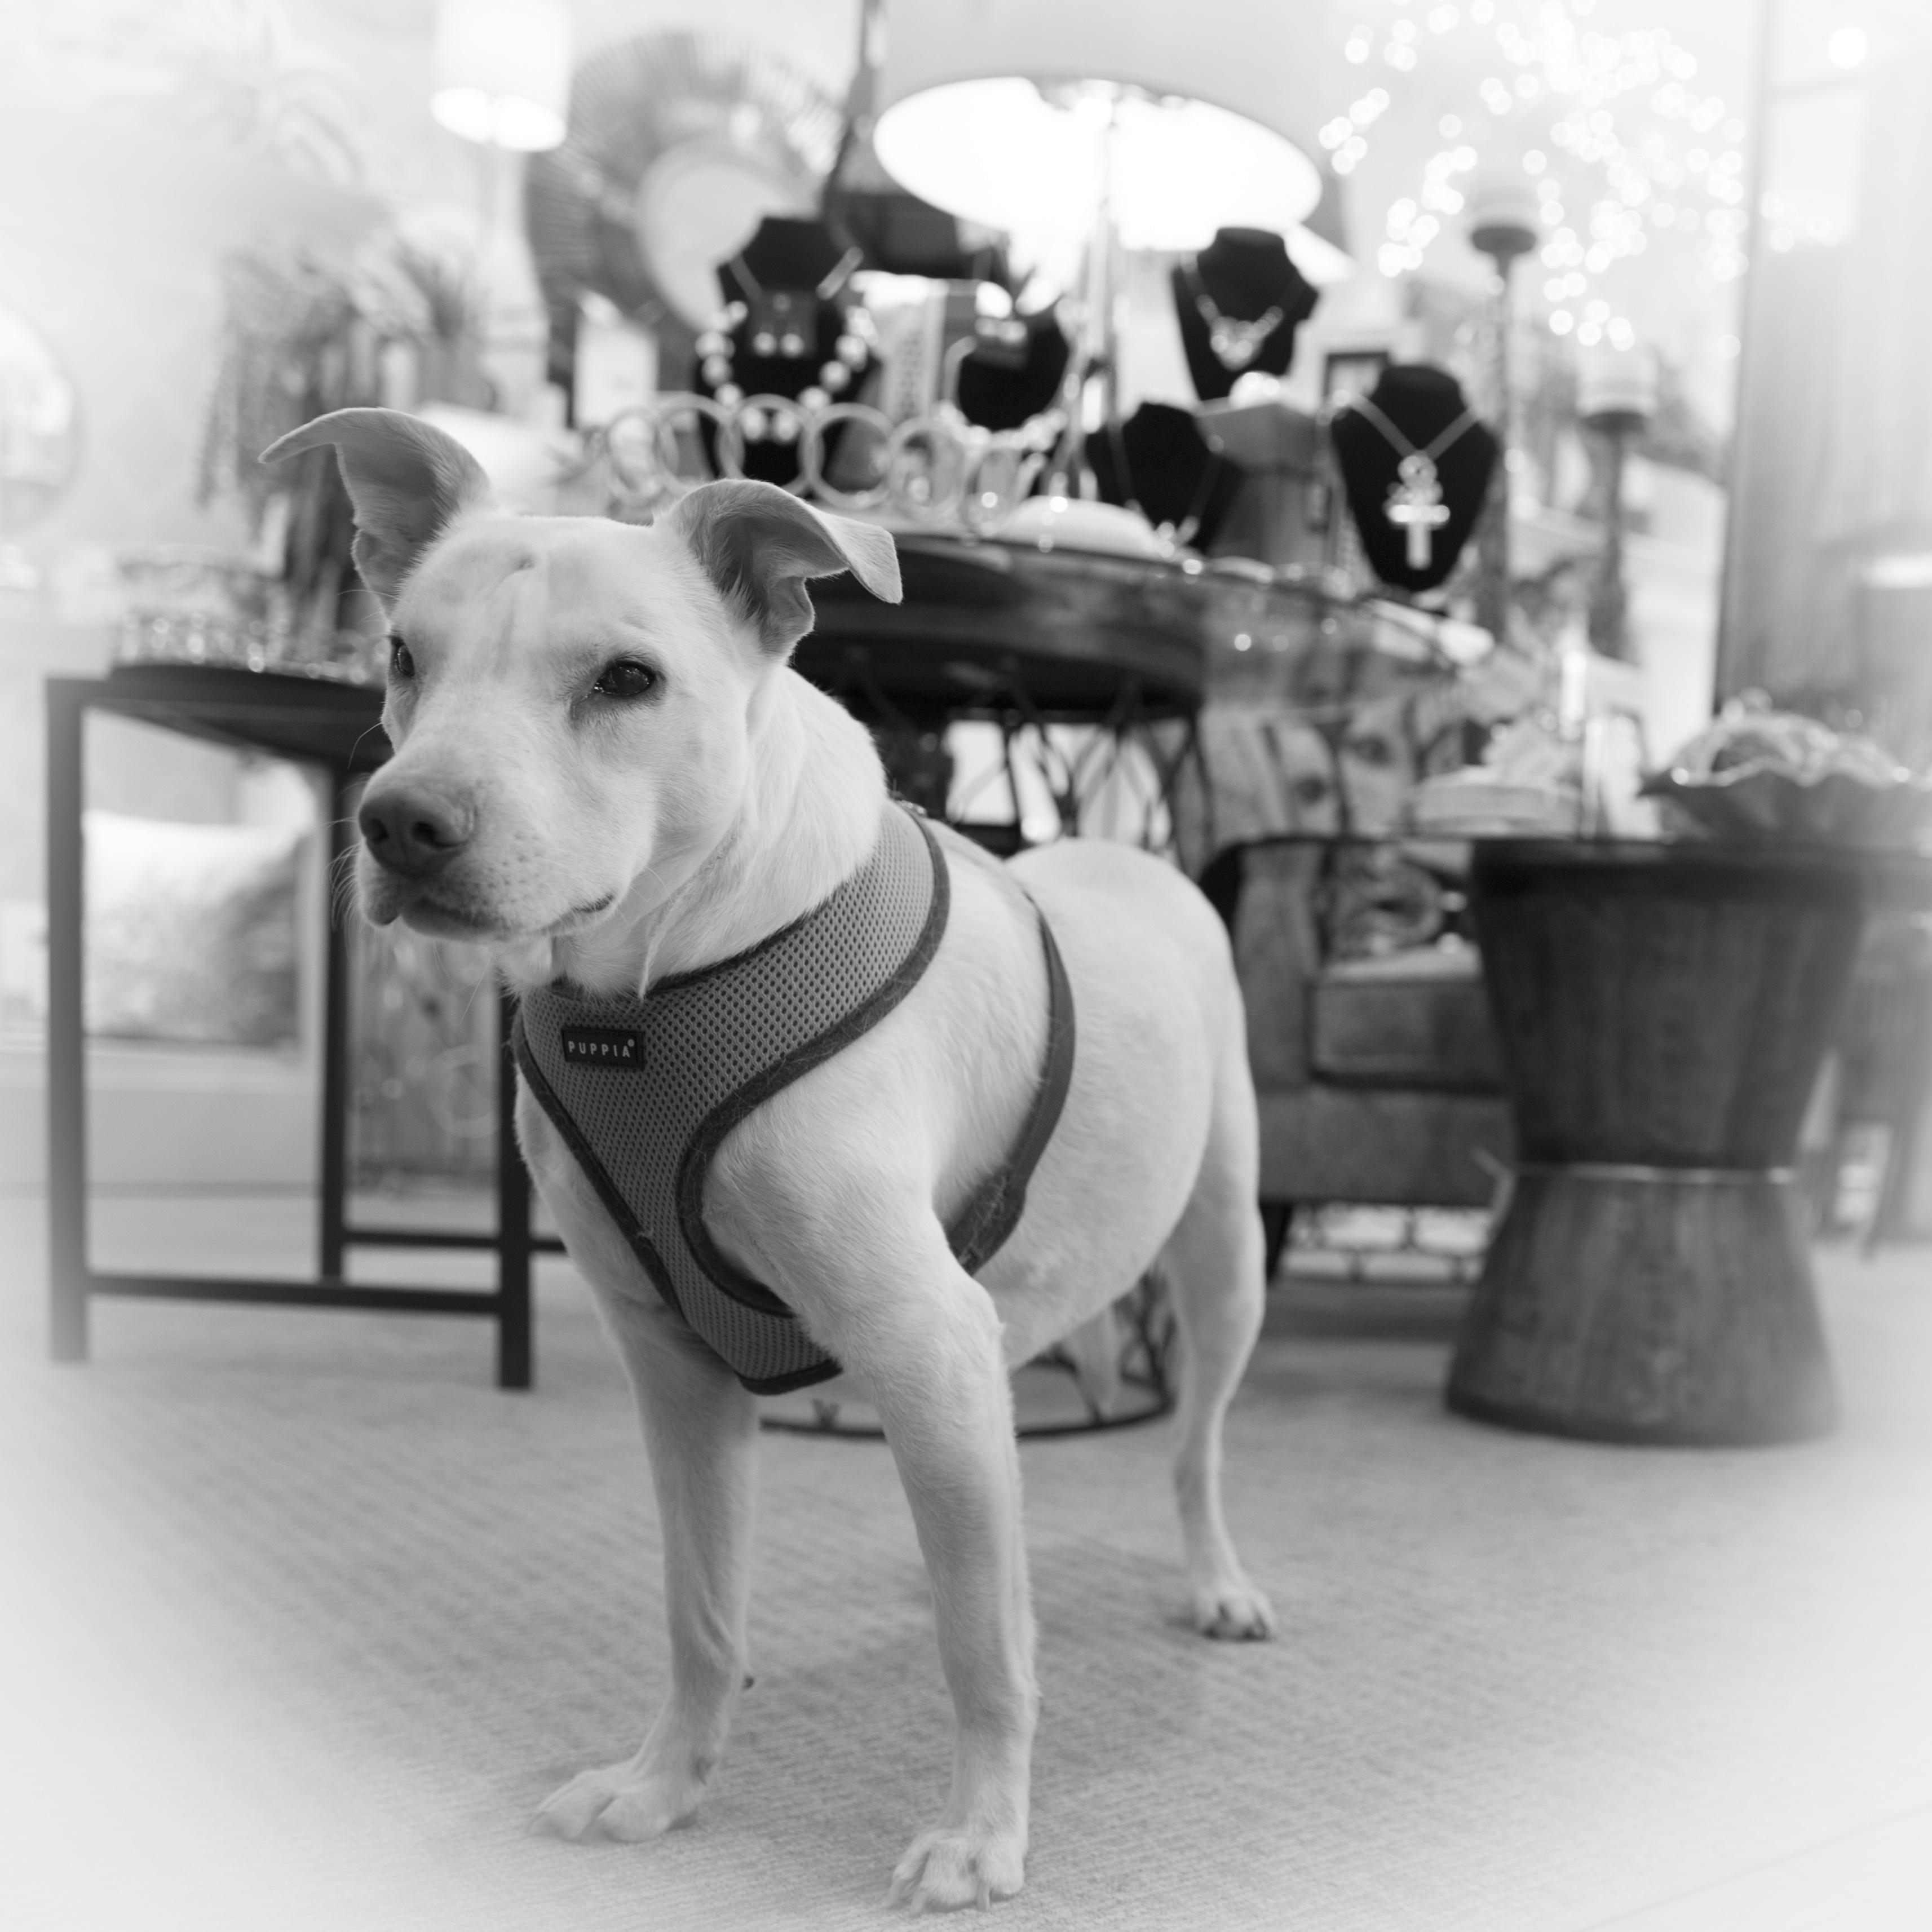 Sydney the Dog